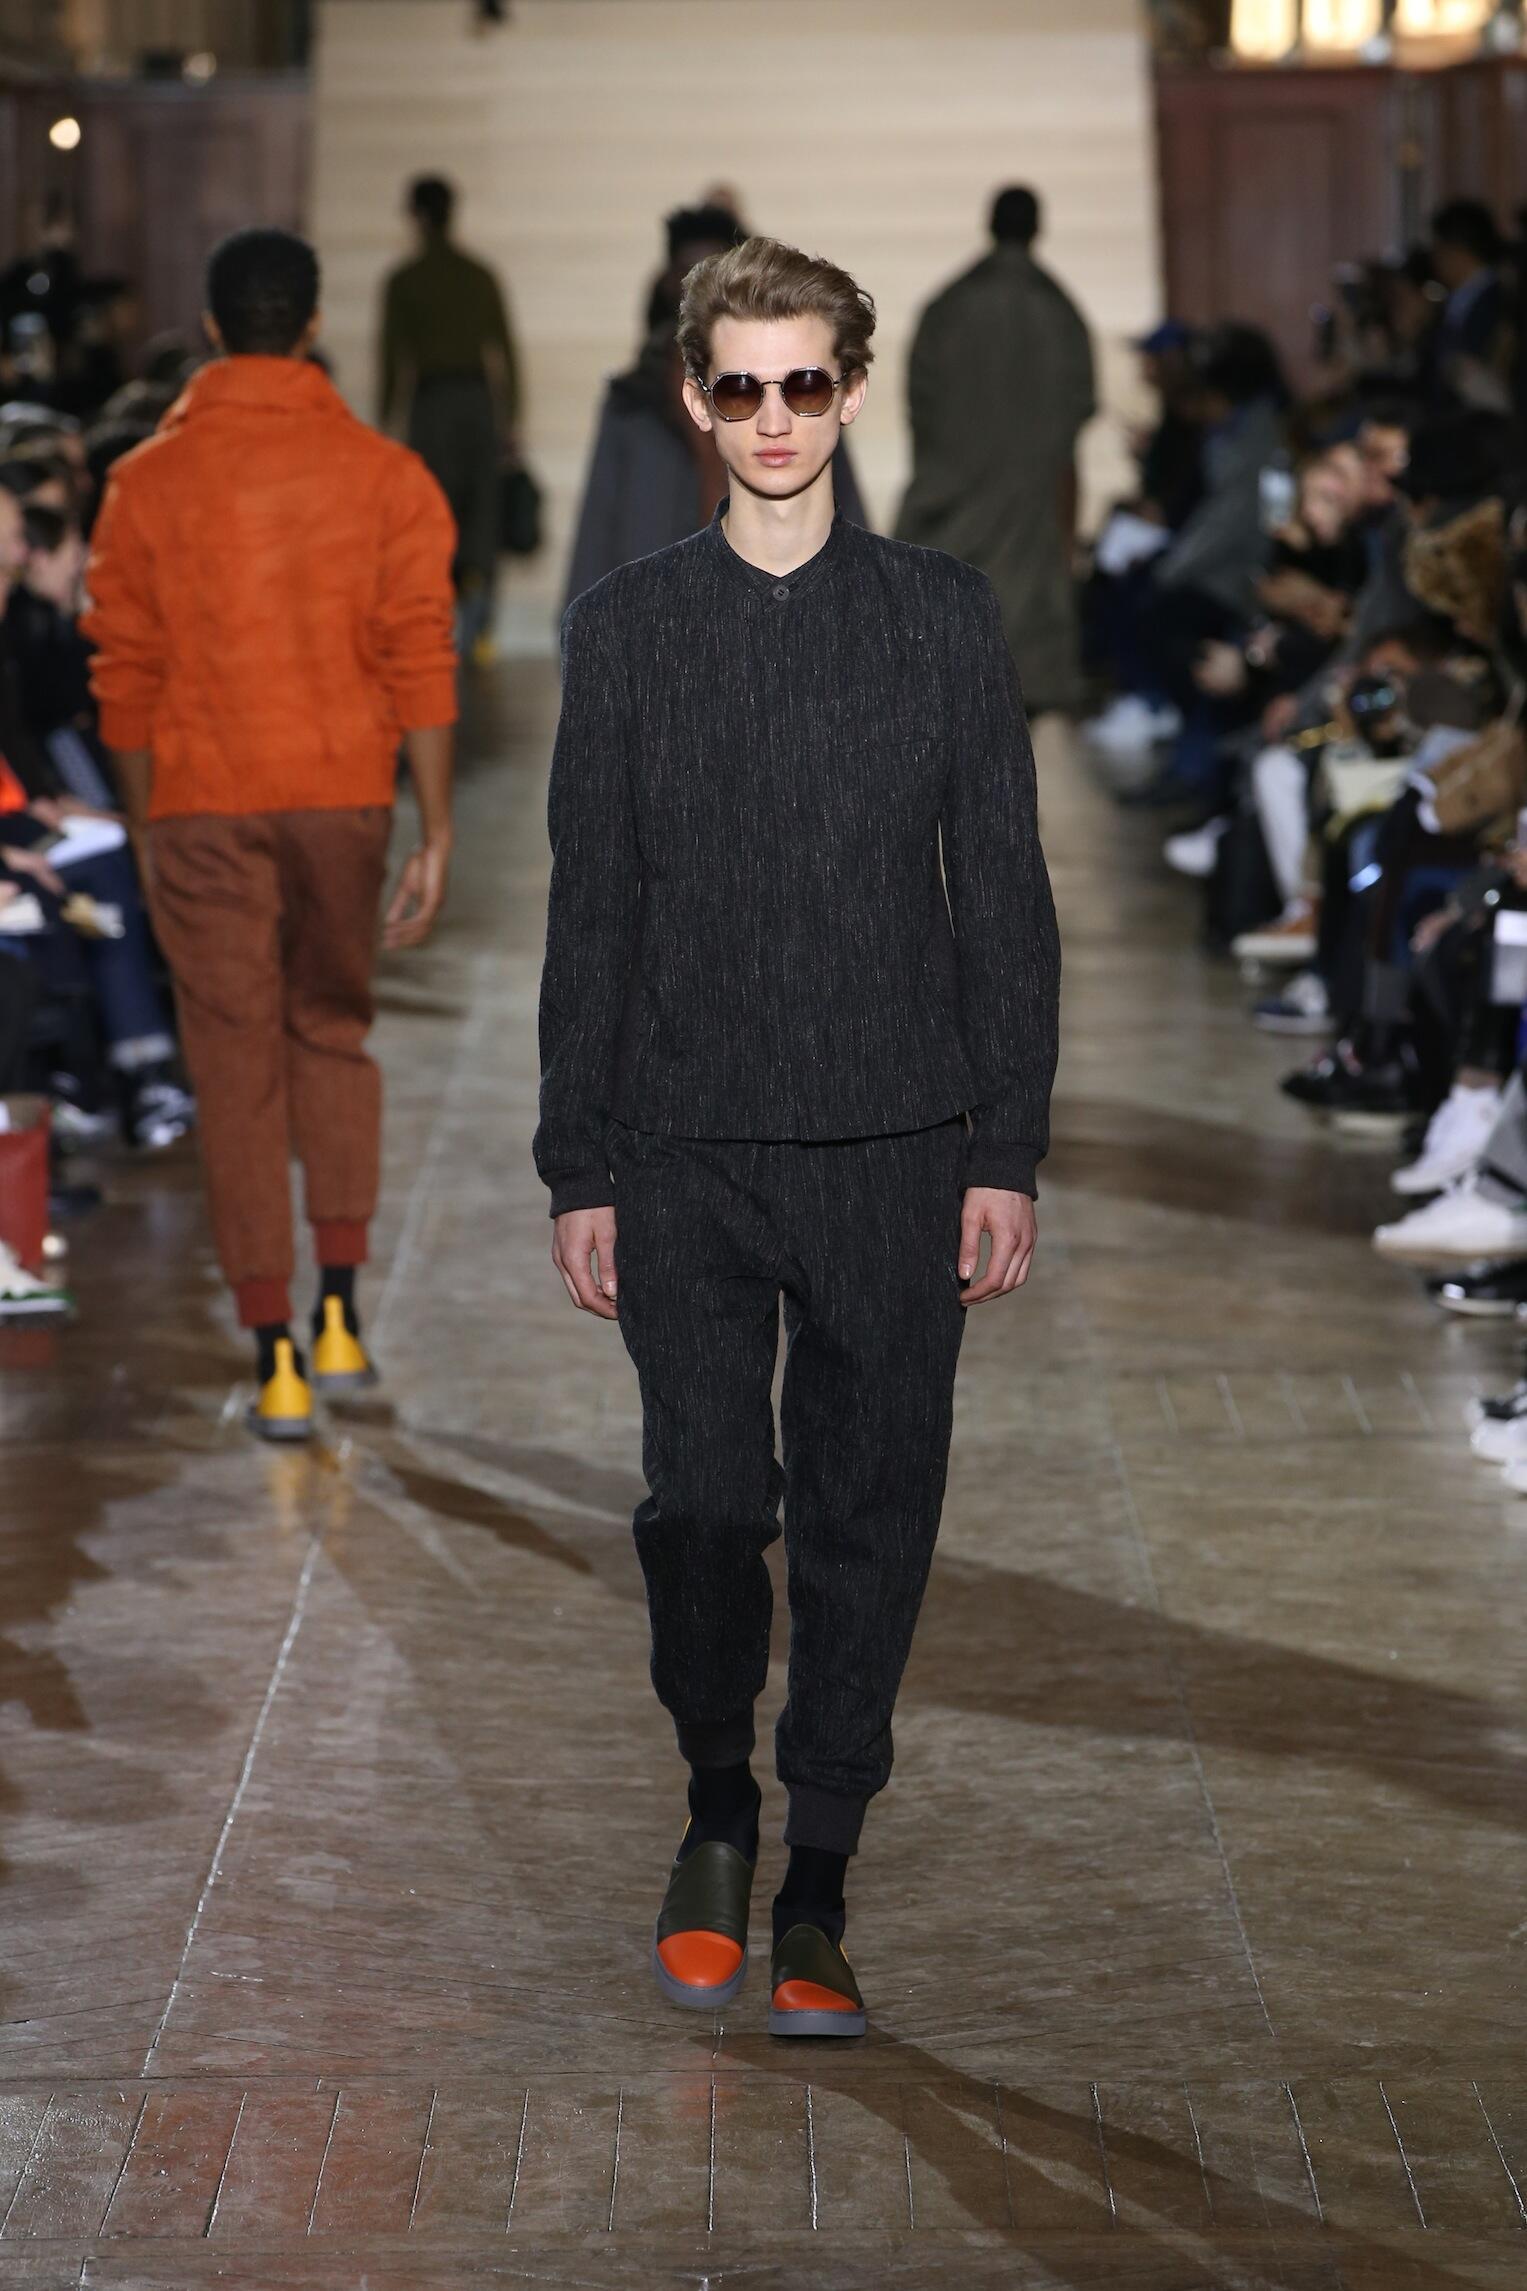 Issey Miyake Fall Winter 2017 Mens Collection Paris Fashion Week